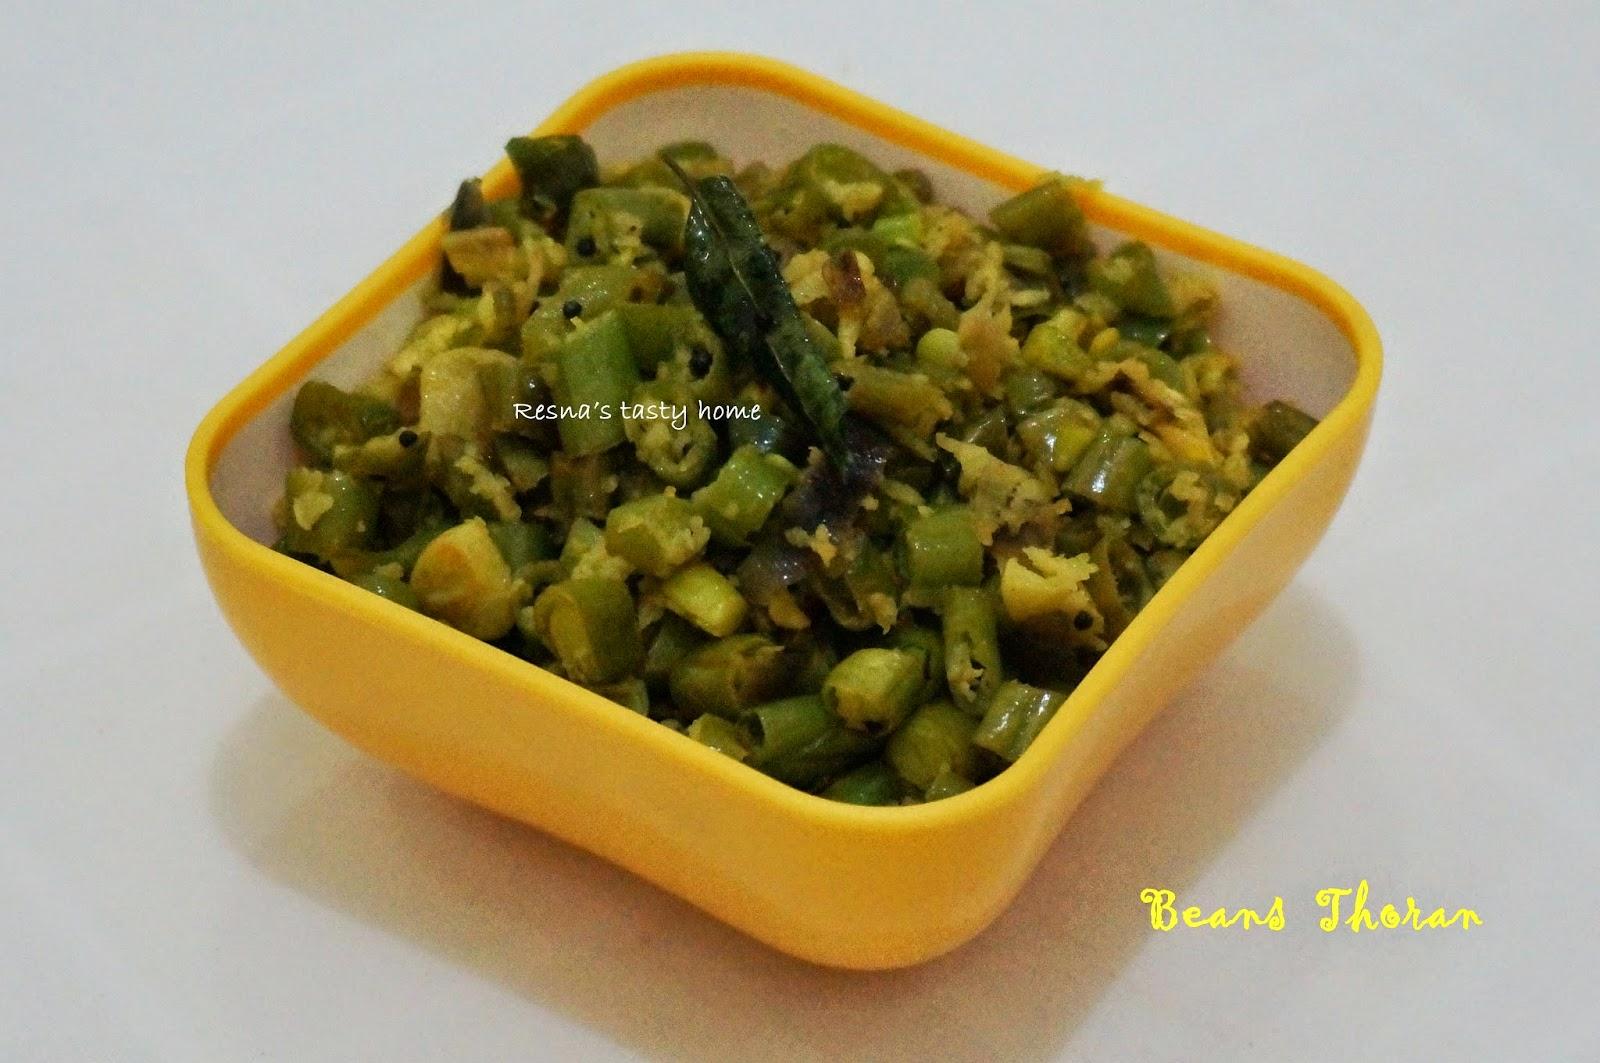 beans thoran / beans upperi / beans stir fry